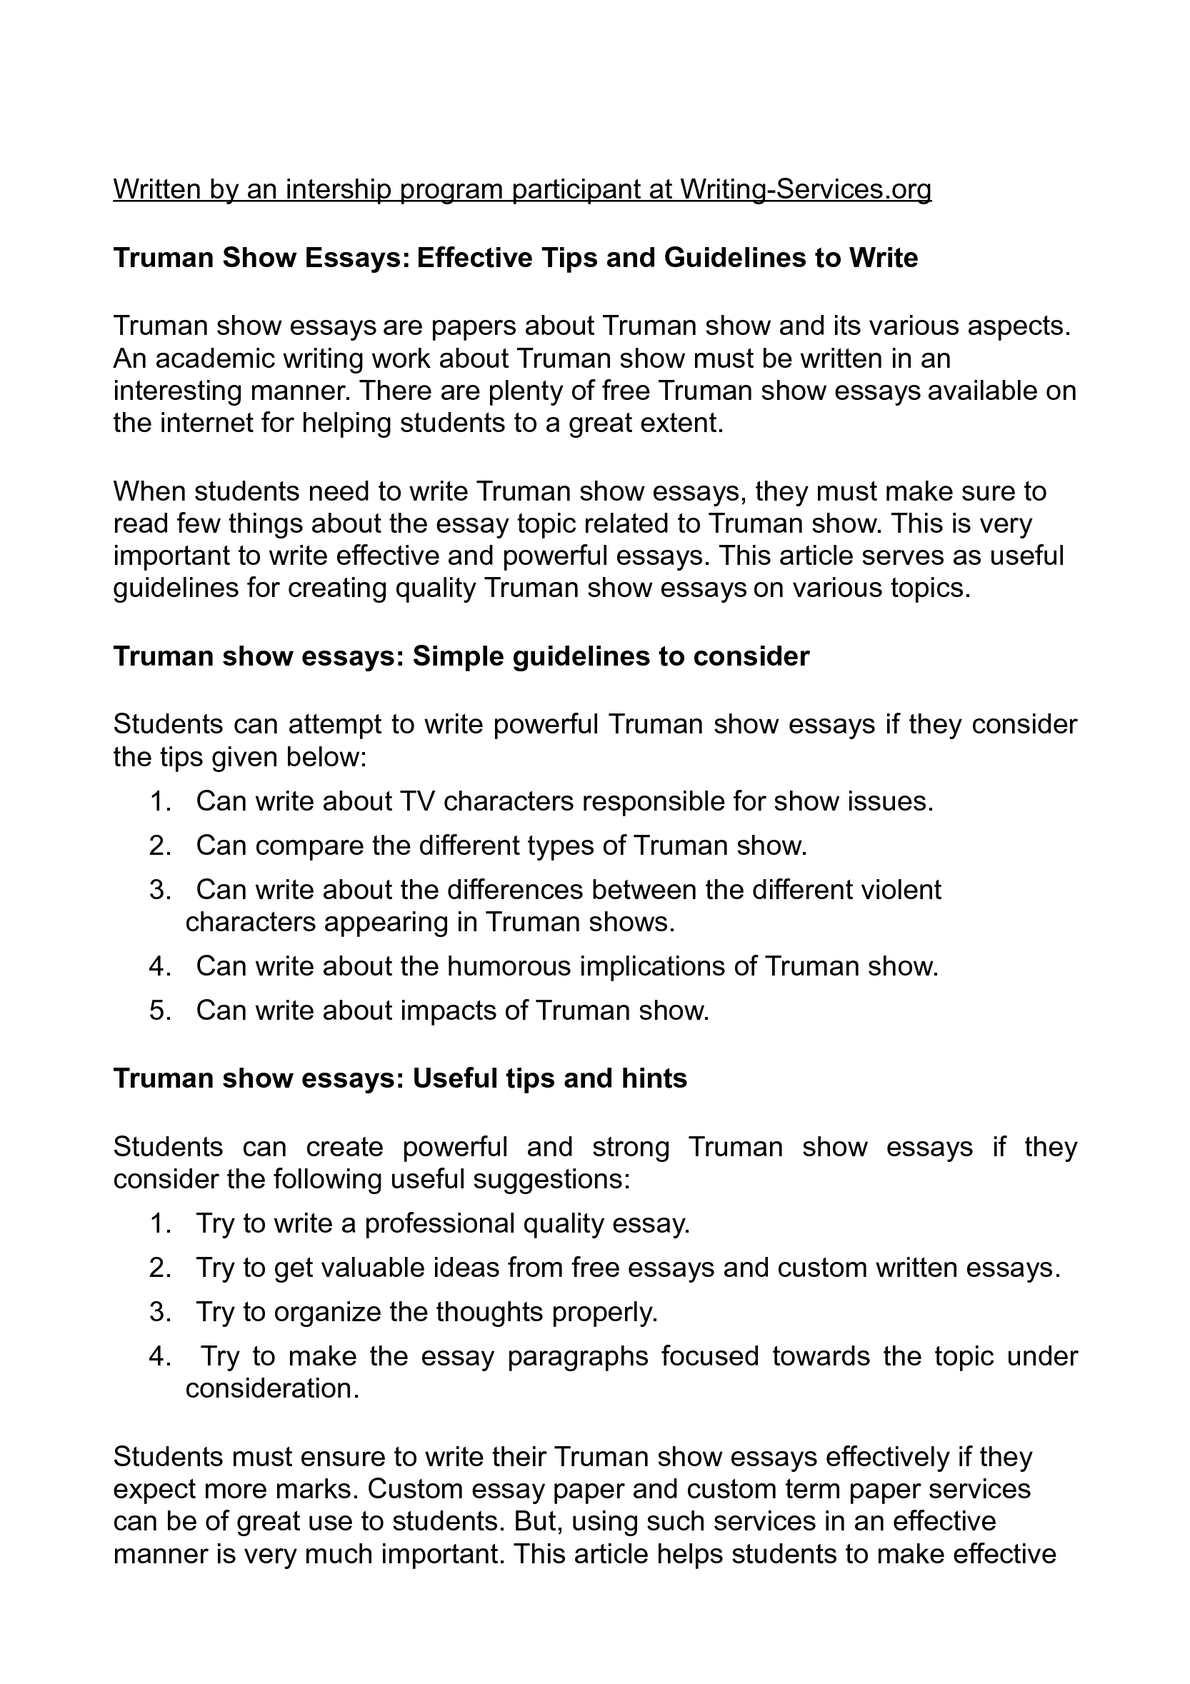 Truman essay question custom article editor service for university